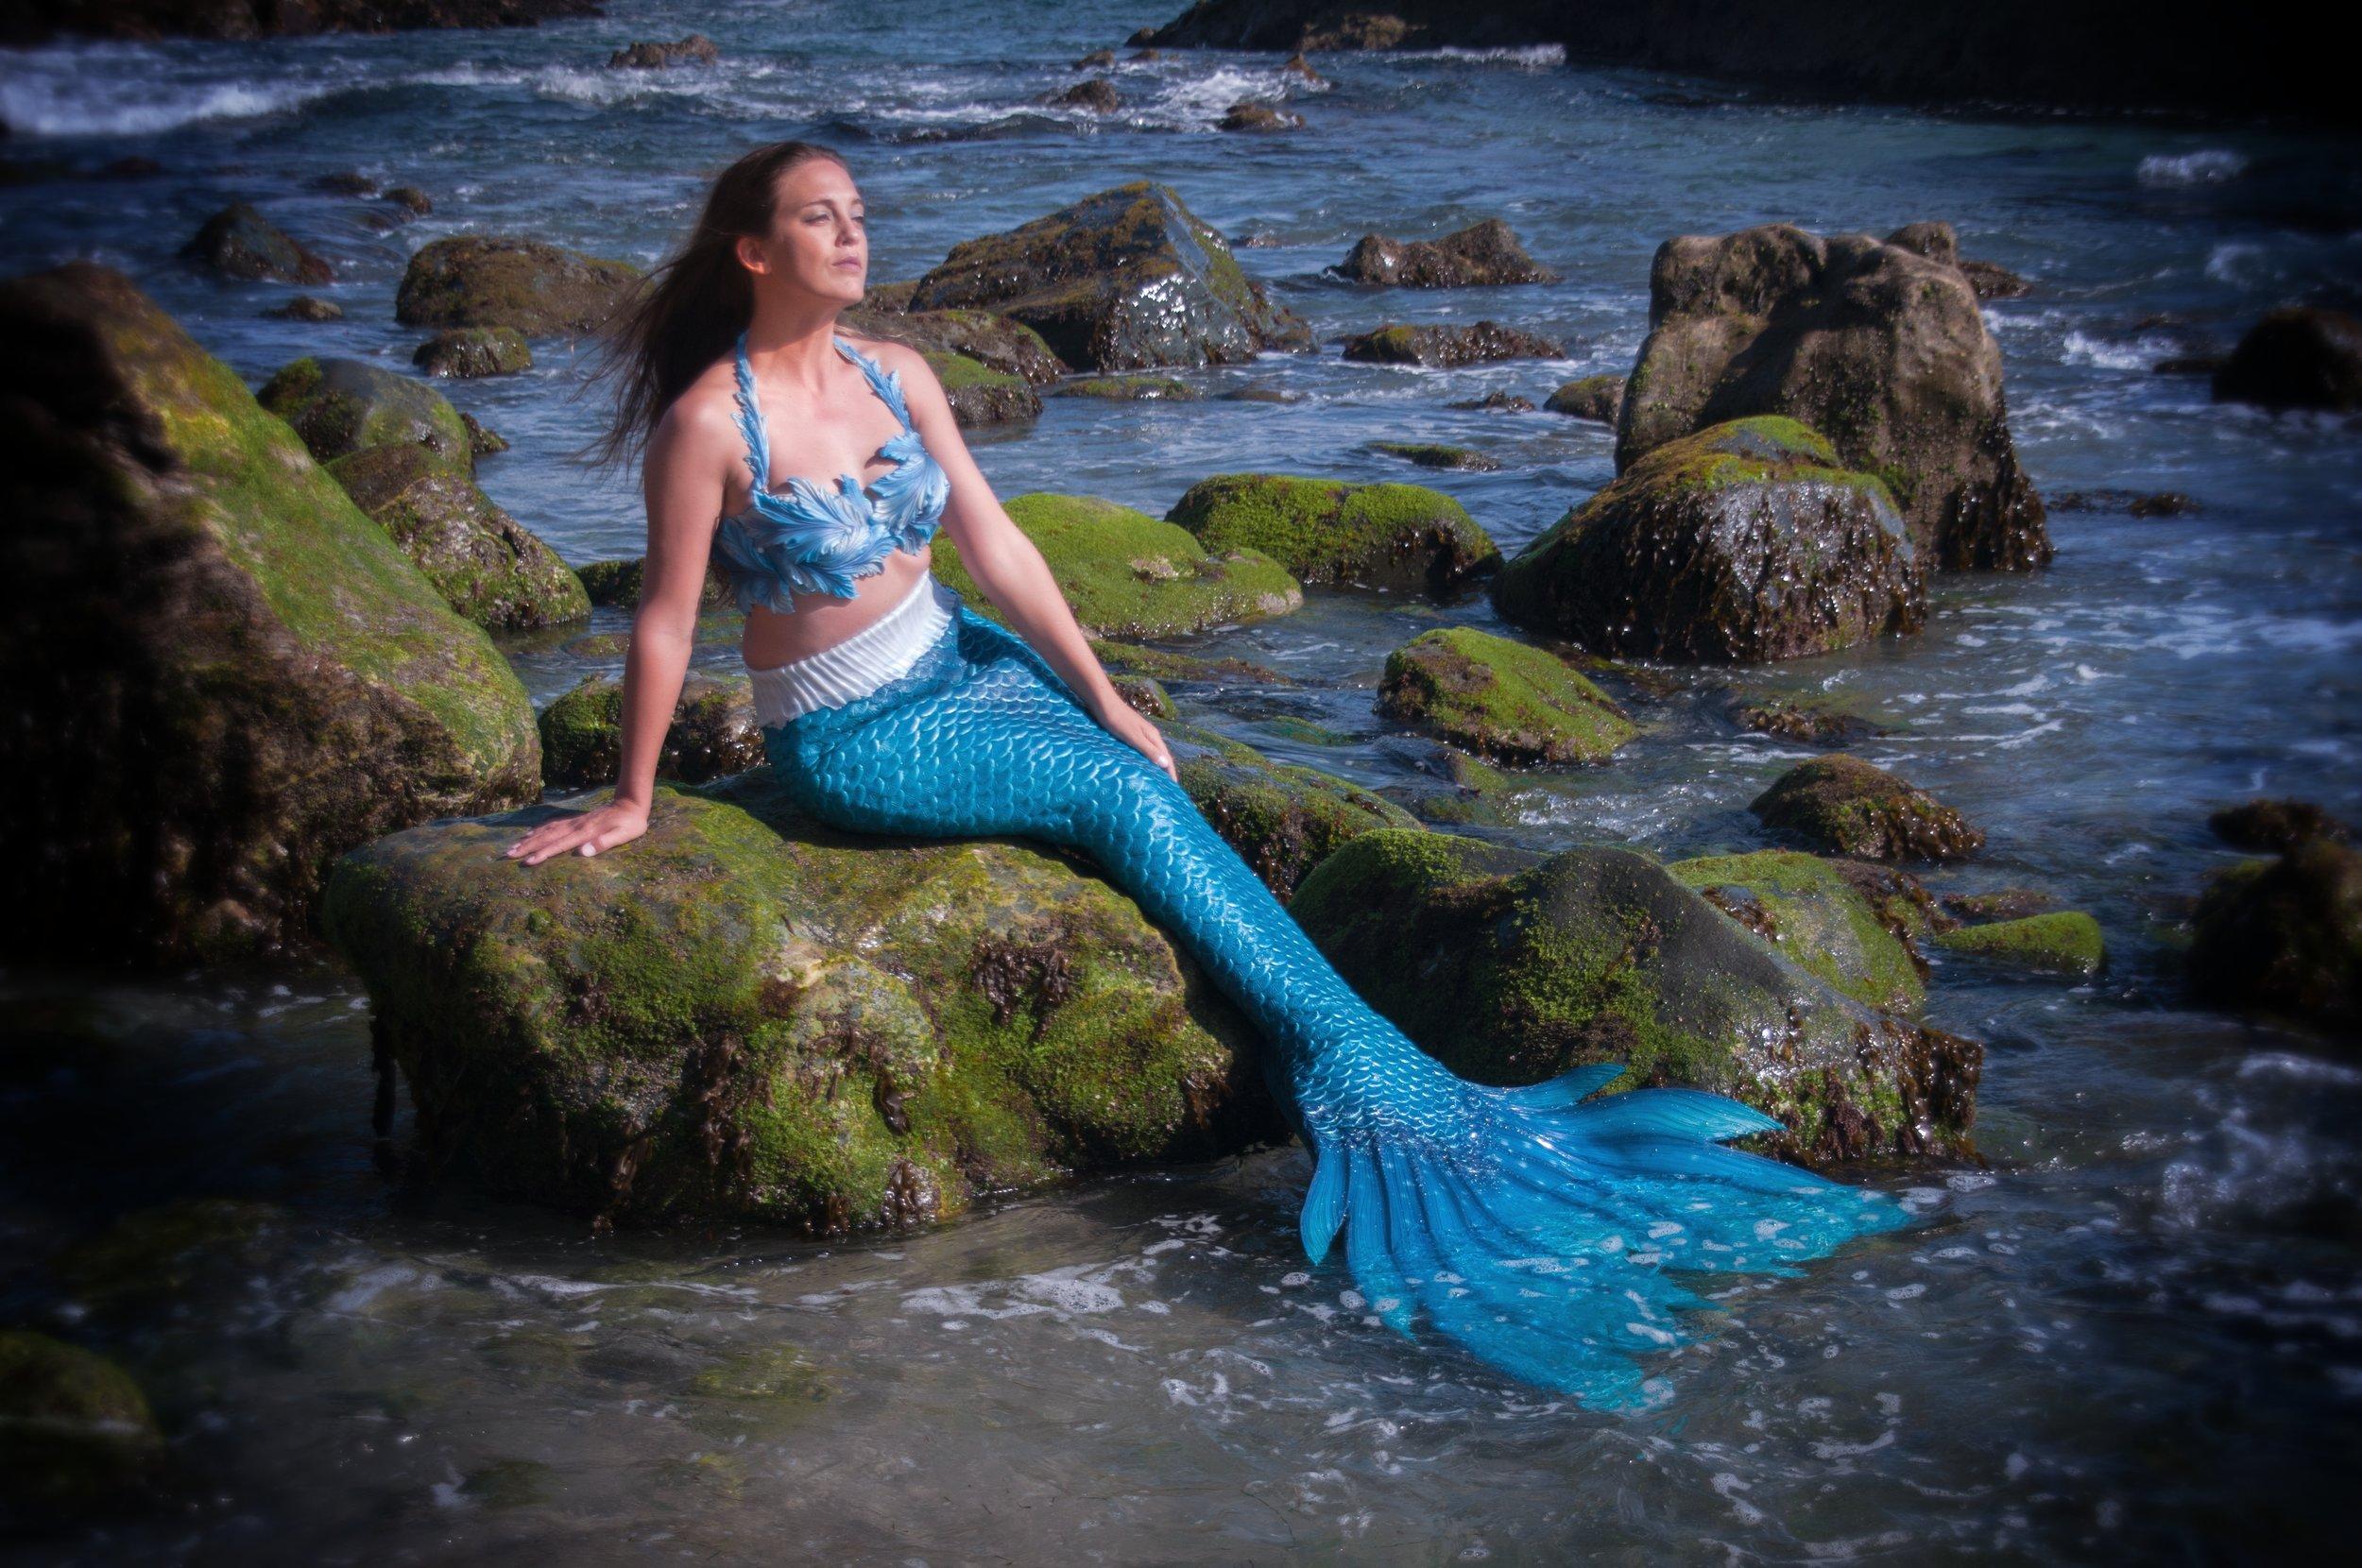 BKS_6464 Mermaid Hilo at Beach 2.jpg